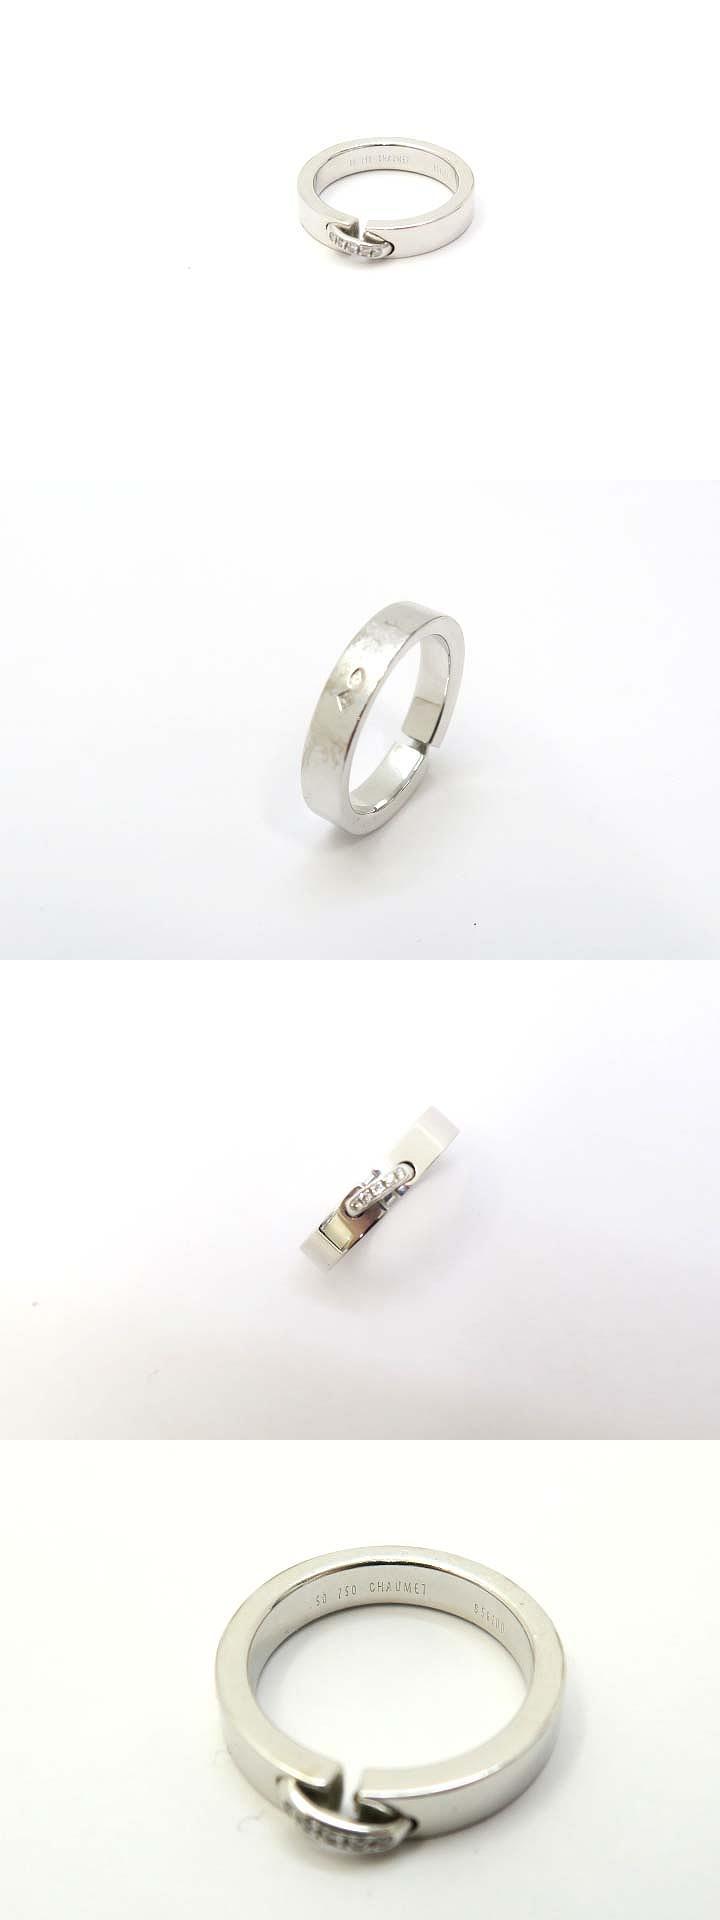 K18WG 750 リアン エヴィダンス 5P ダイヤモンド リング 指輪 50 ホワイトゴールド